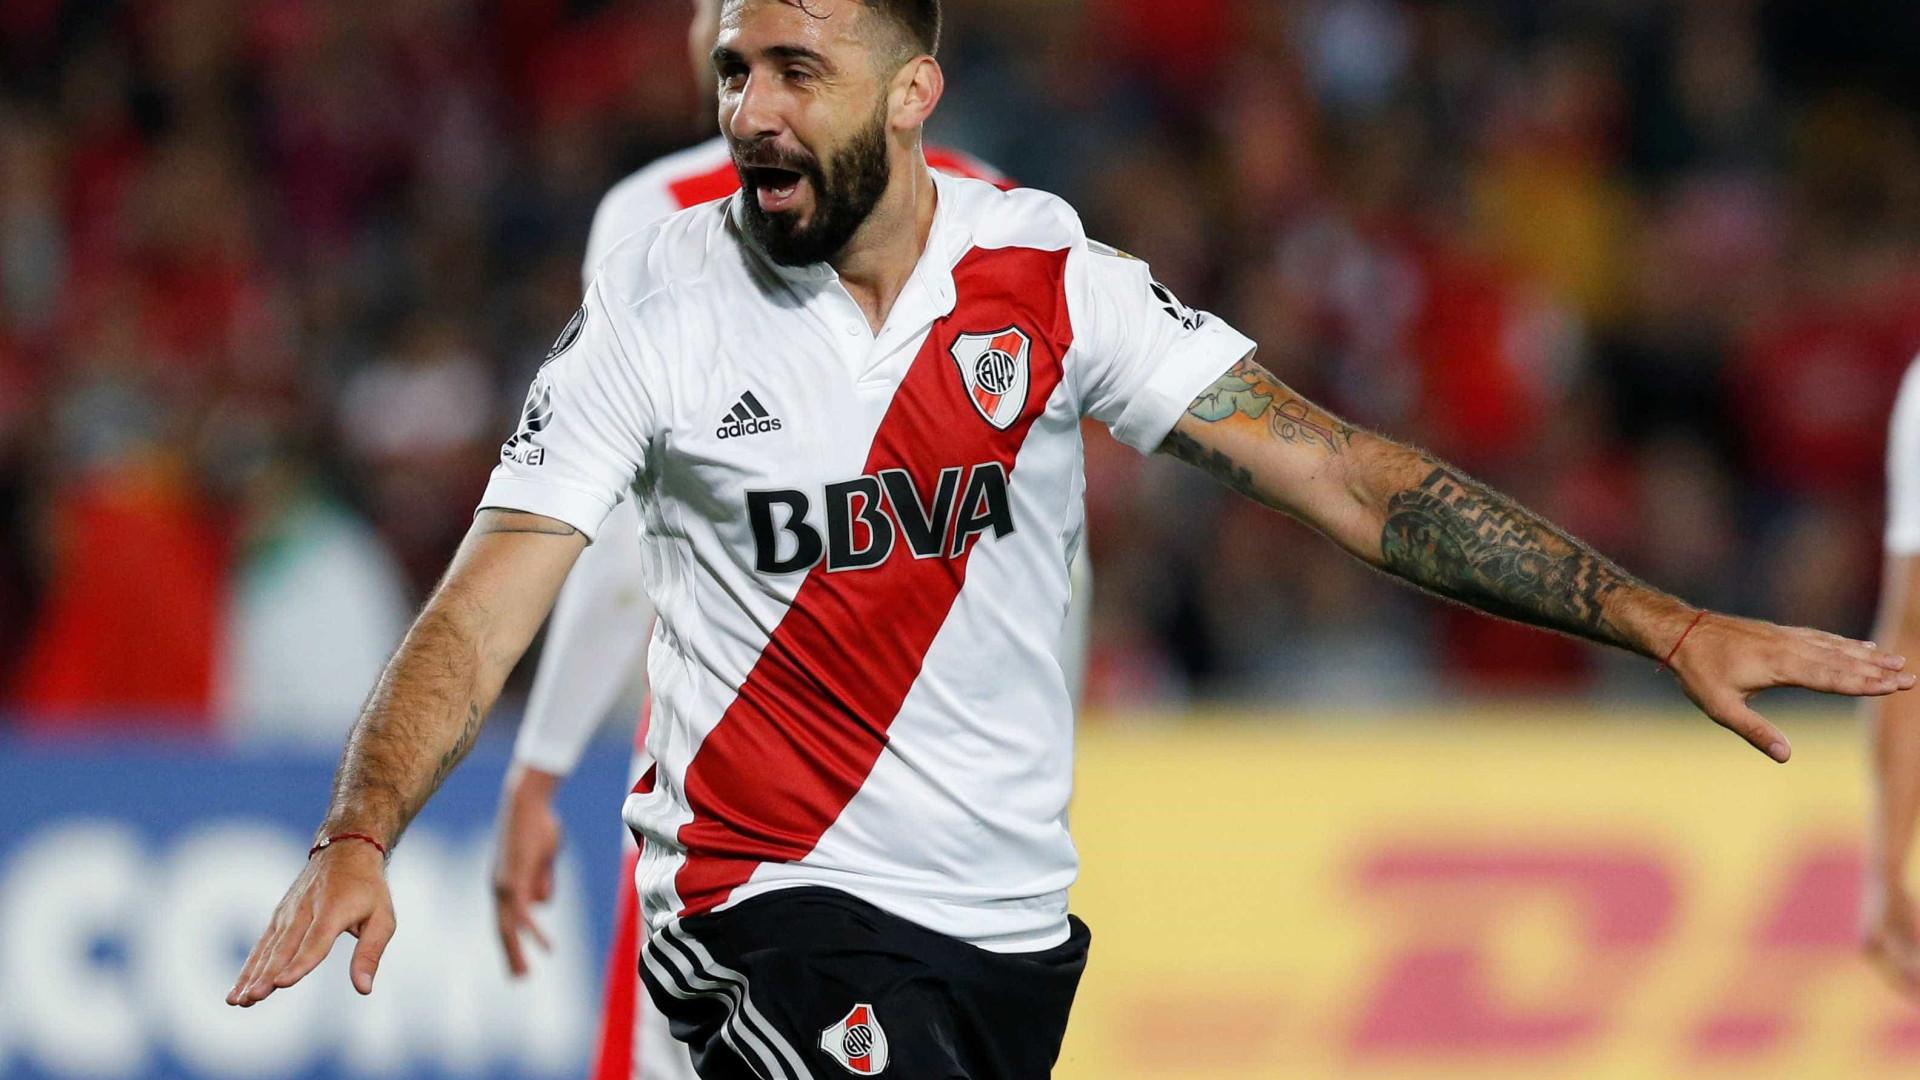 Torcedor do Boca, Pratto enfrenta seu time na final da Libertadores